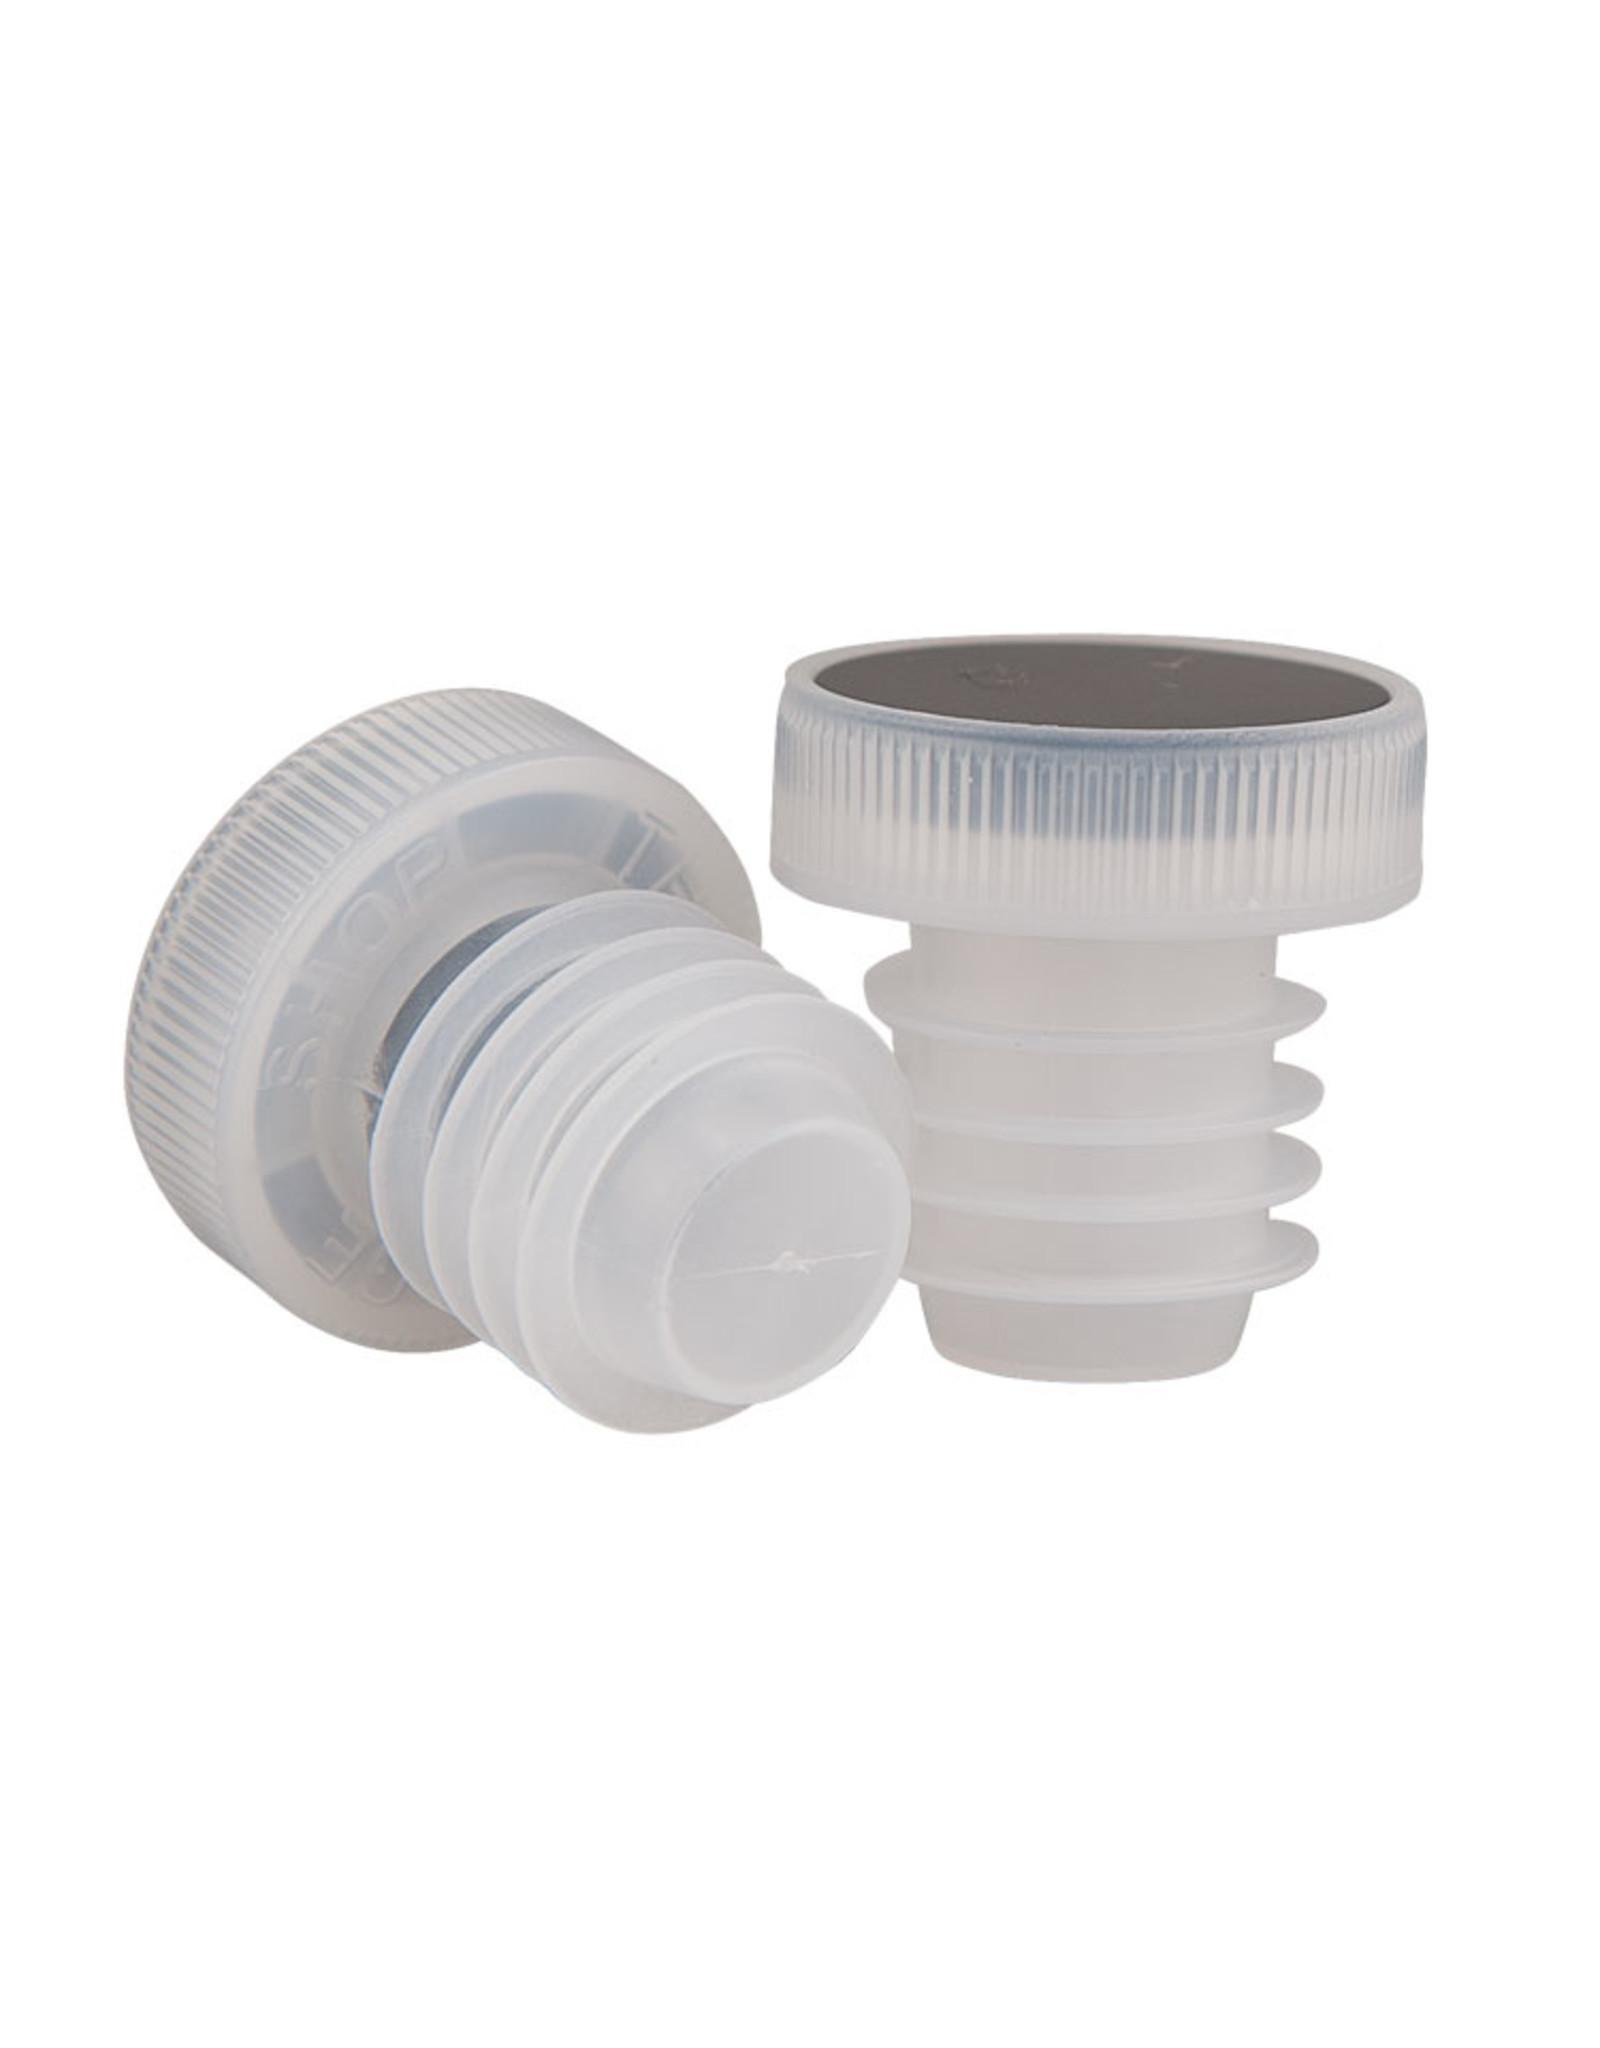 Corks - Plastic Tasting Corks Bag/25